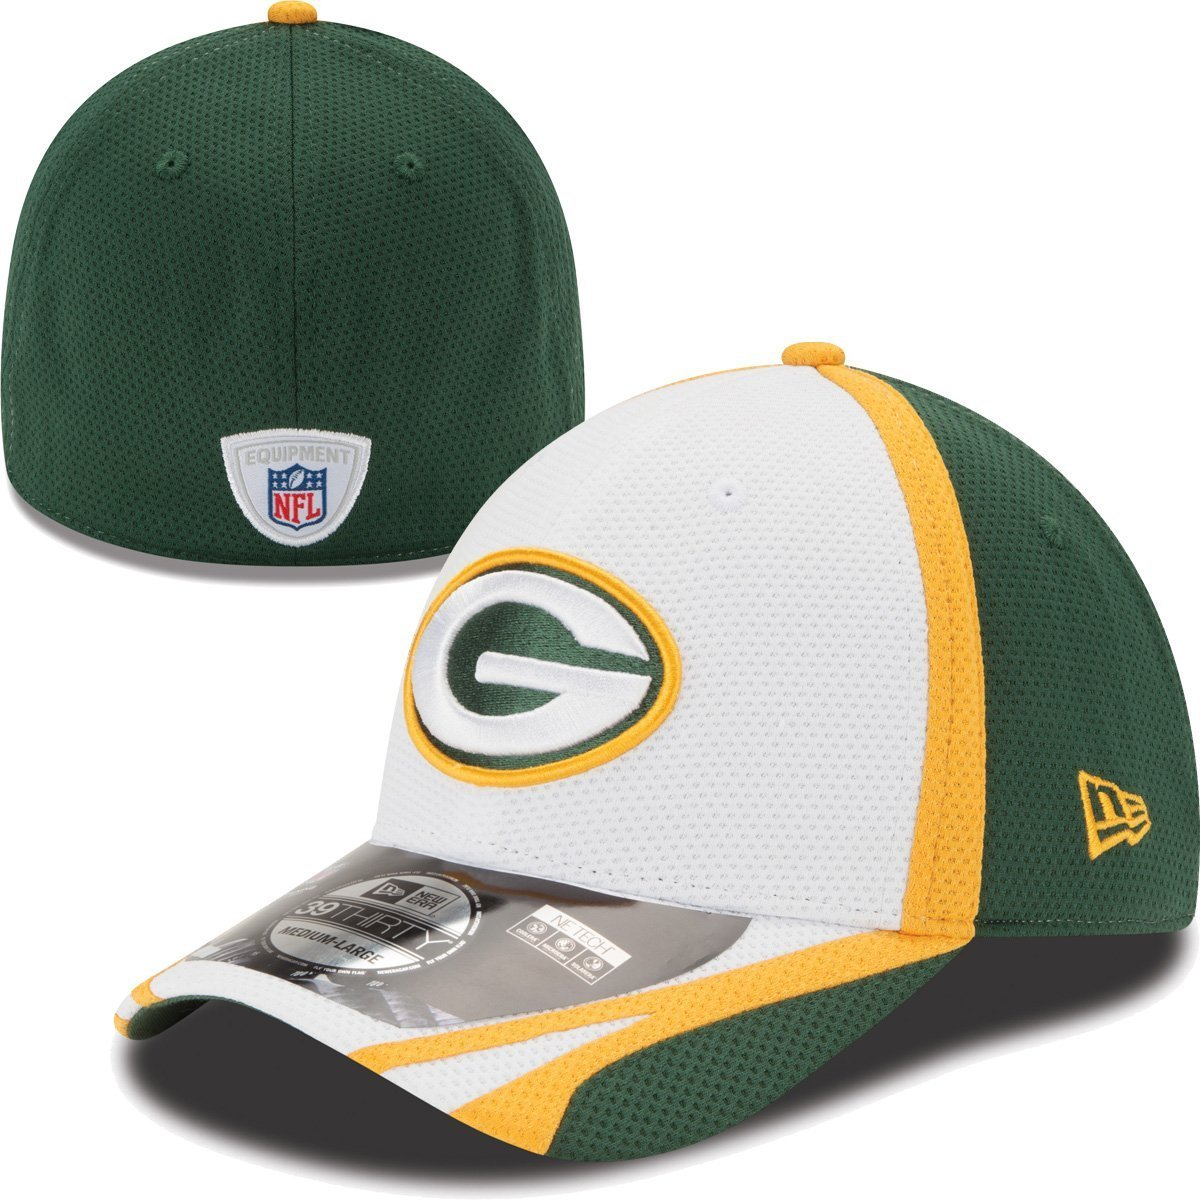 Green Bay Packers新しいEra 39thirty 2014公式トレーニングフレックスフィット帽子 – ホワイト XL  B00KPG65NK